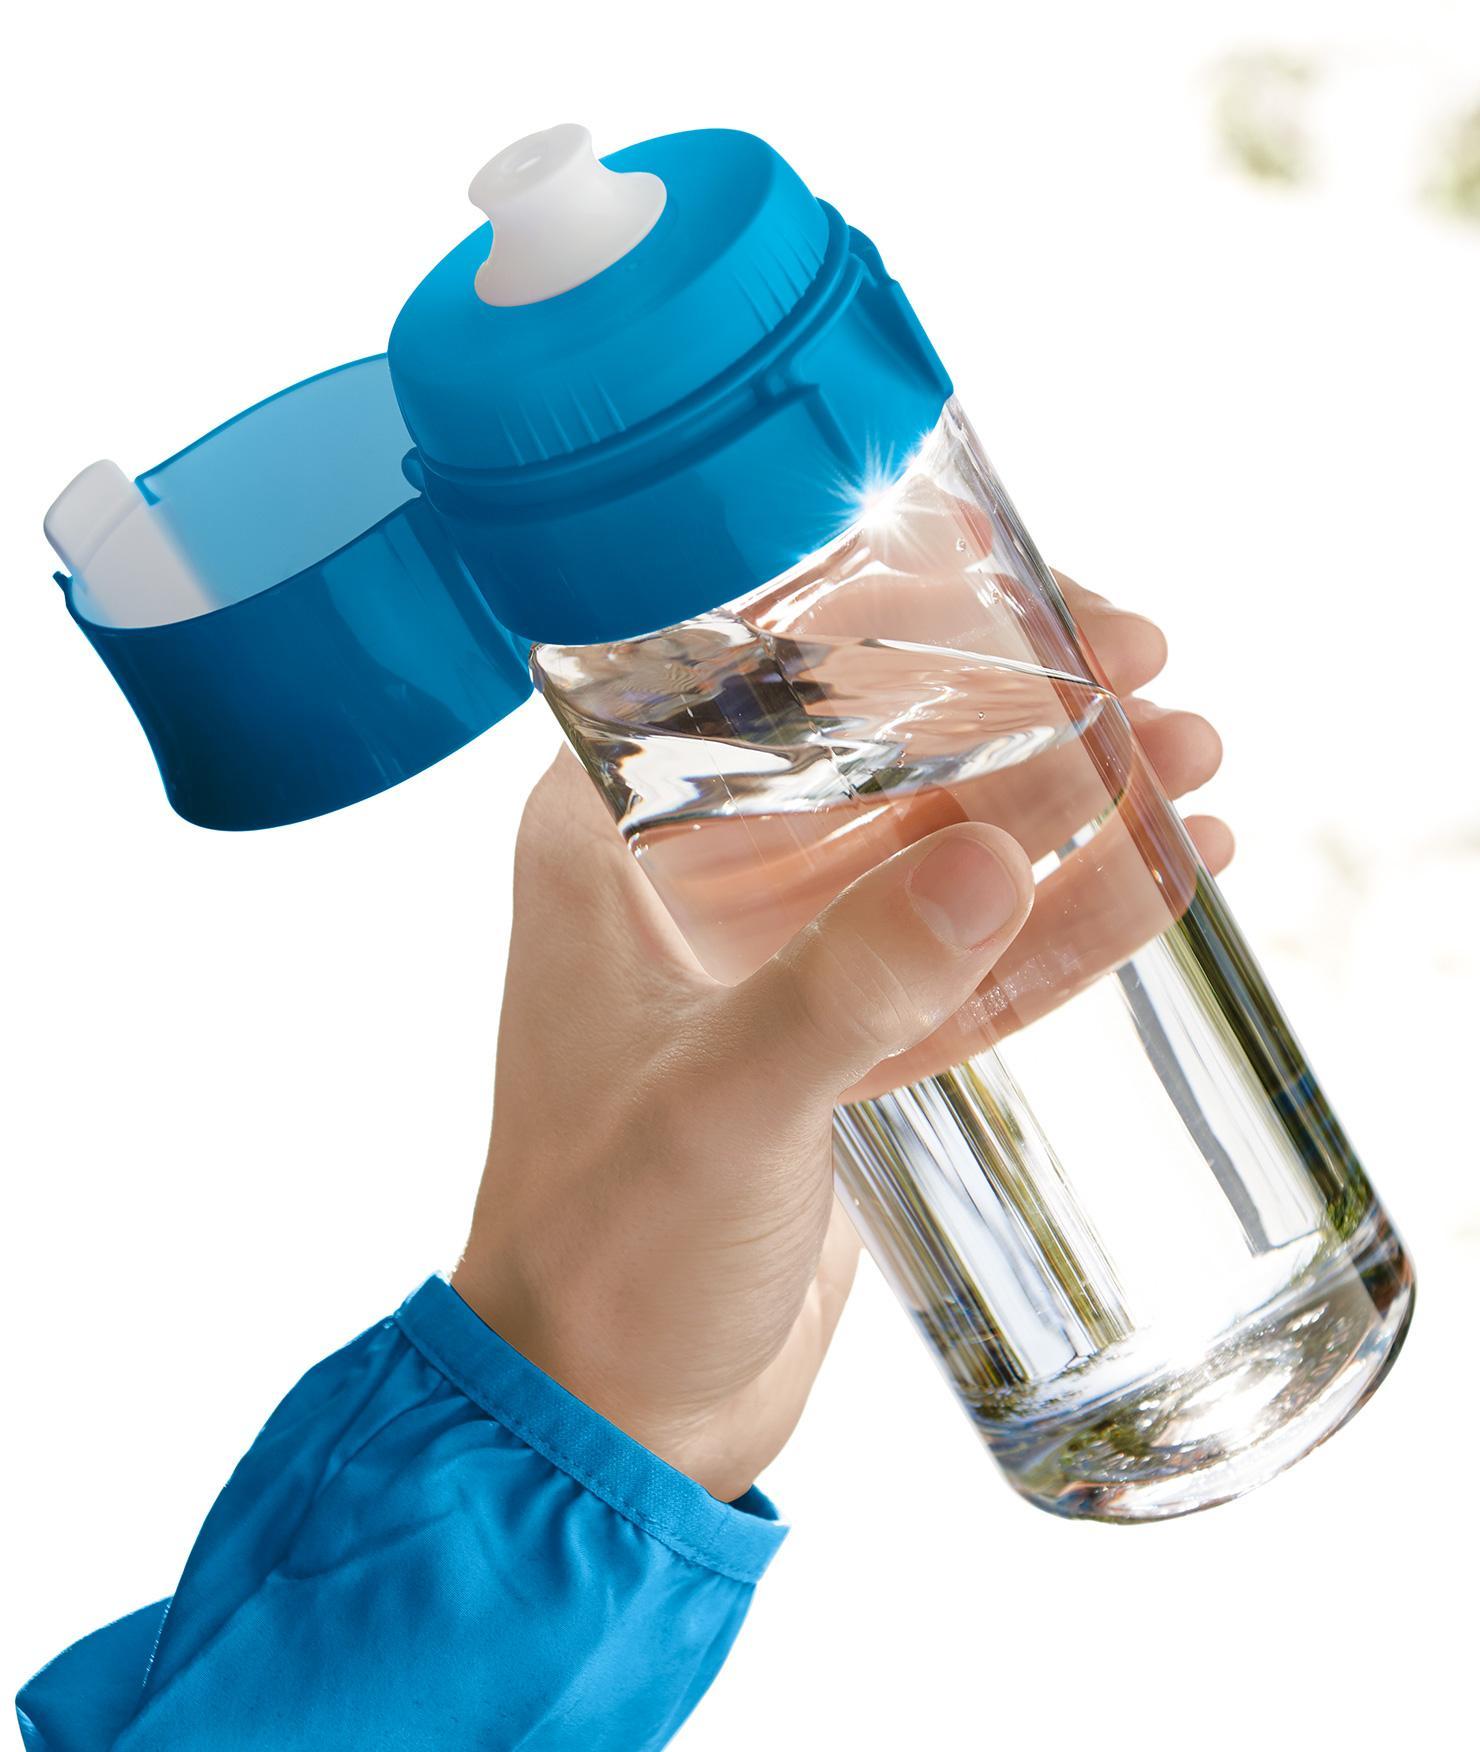 BRITA fill&go Vital 隨身濾水瓶 blue—在公園的男士與運動水瓶